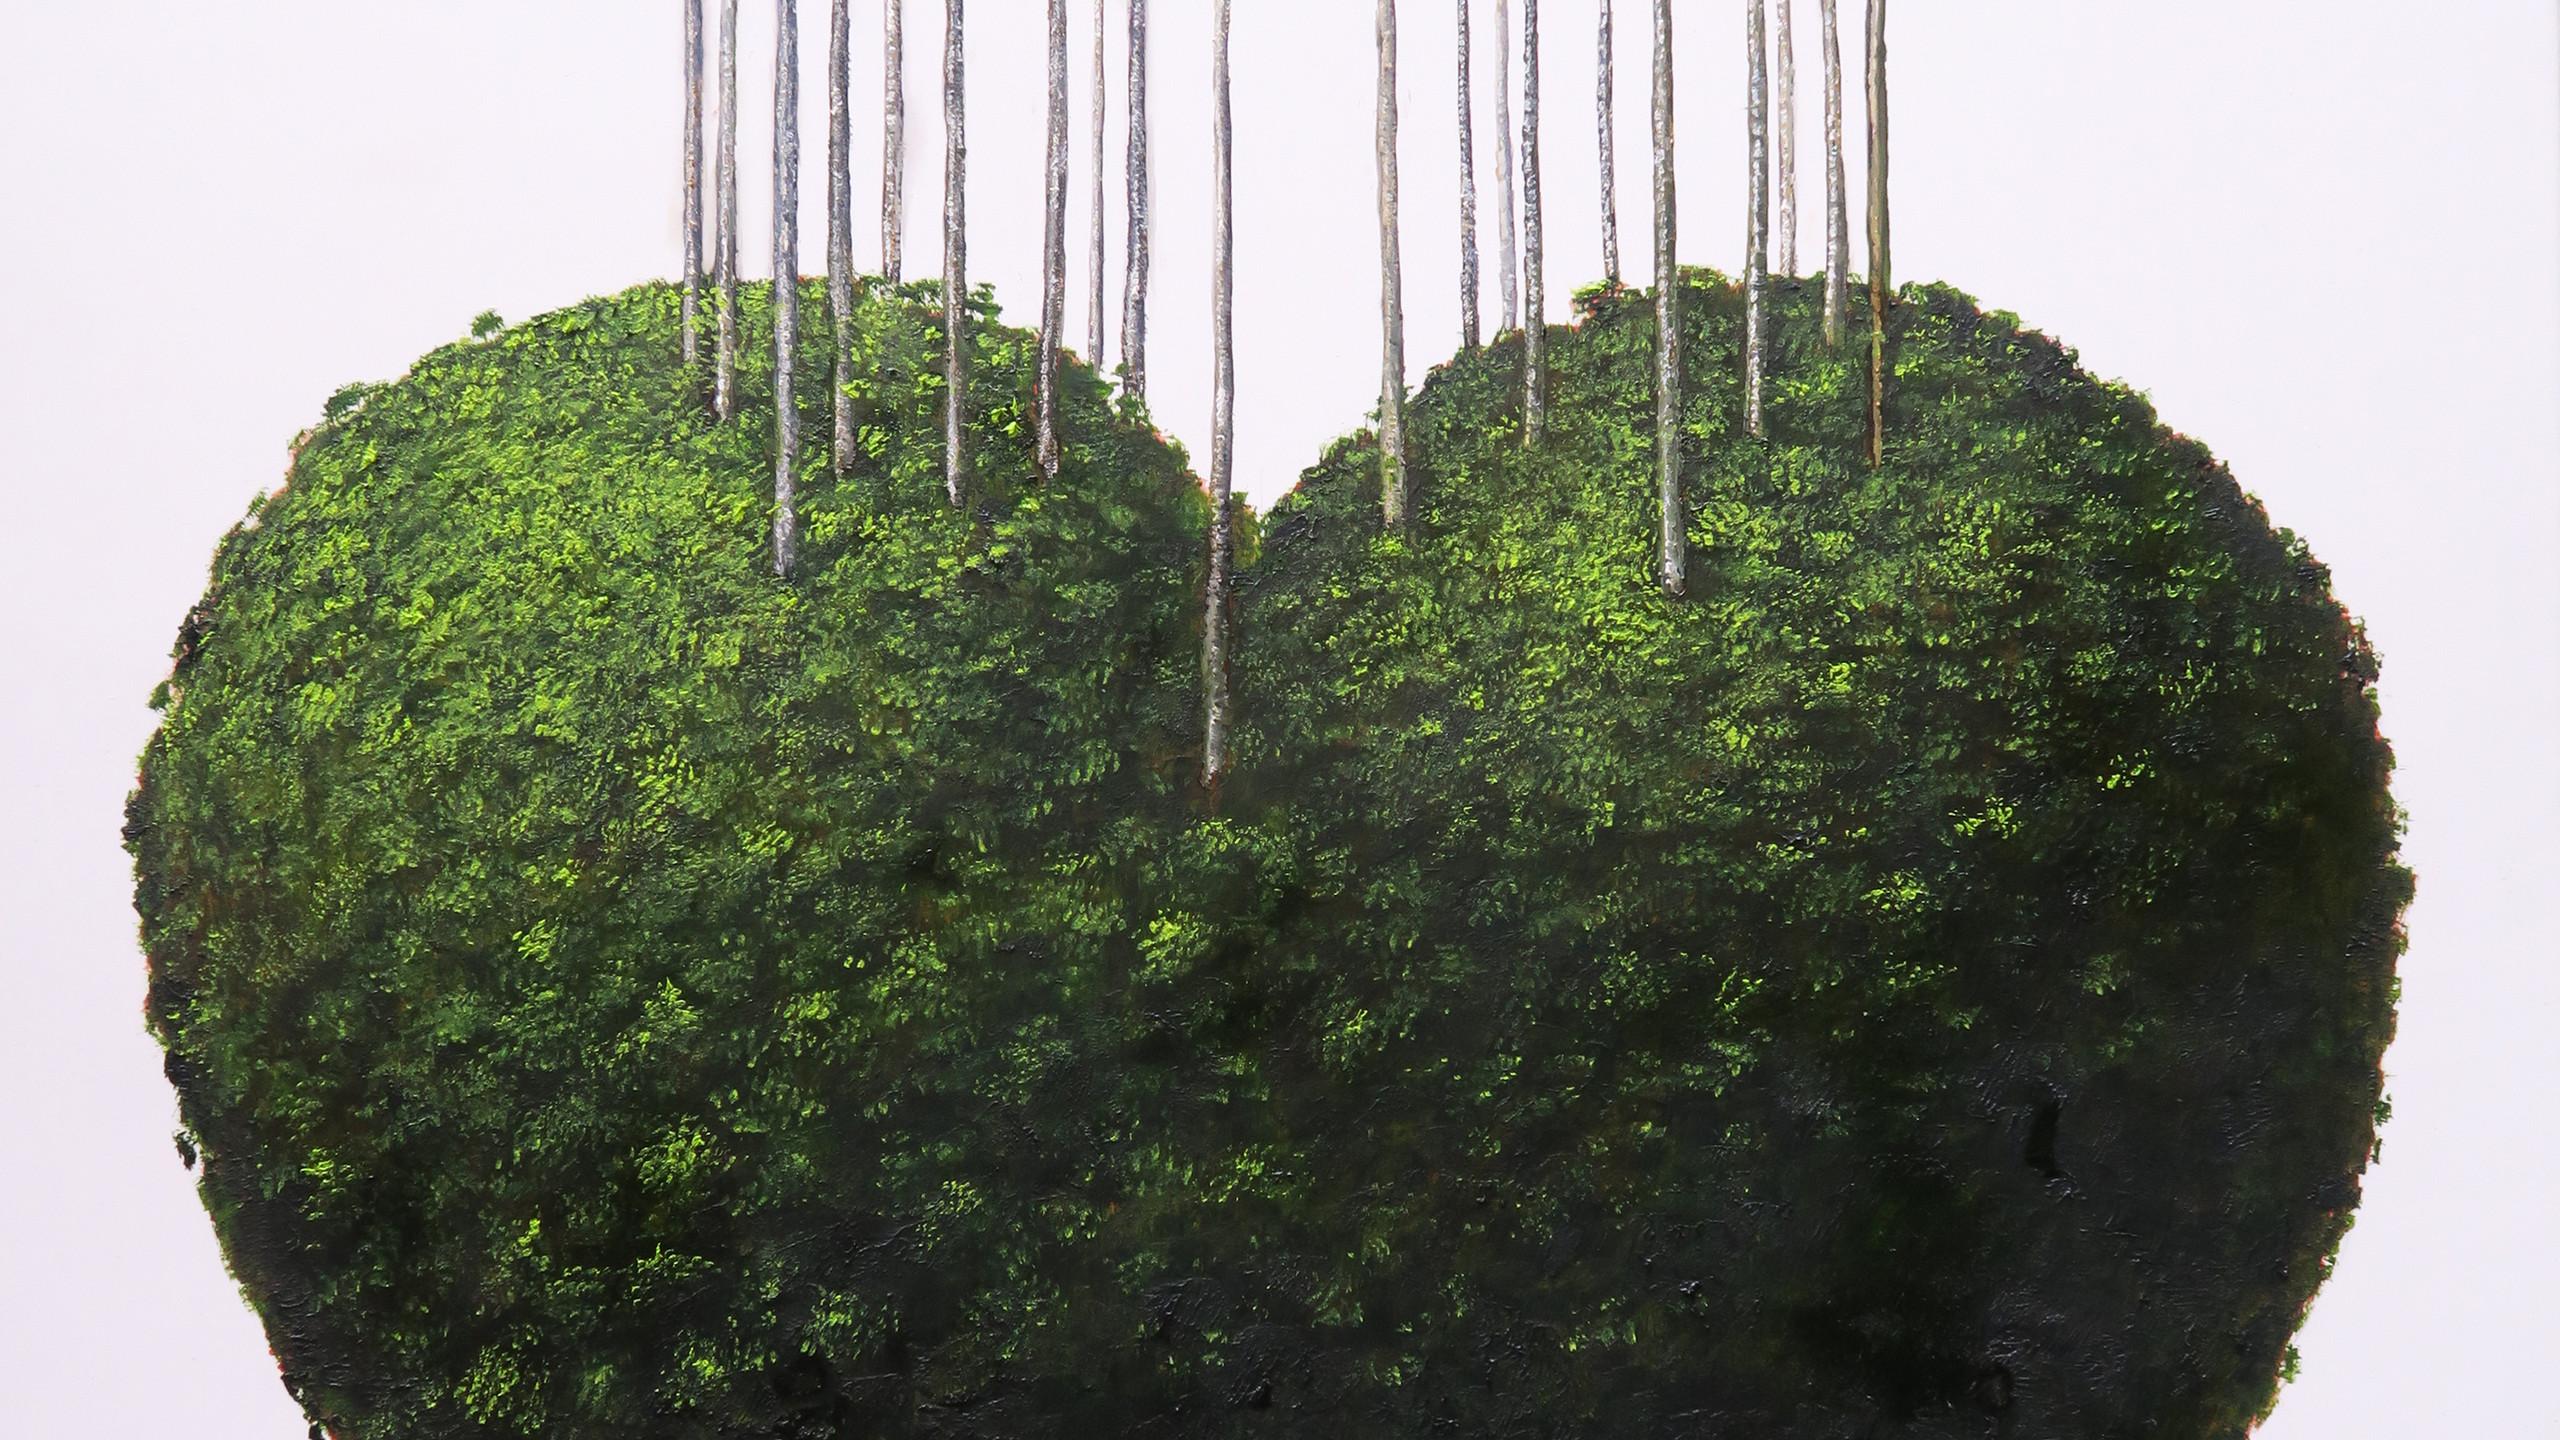 jardin-del-corazon-1556569398